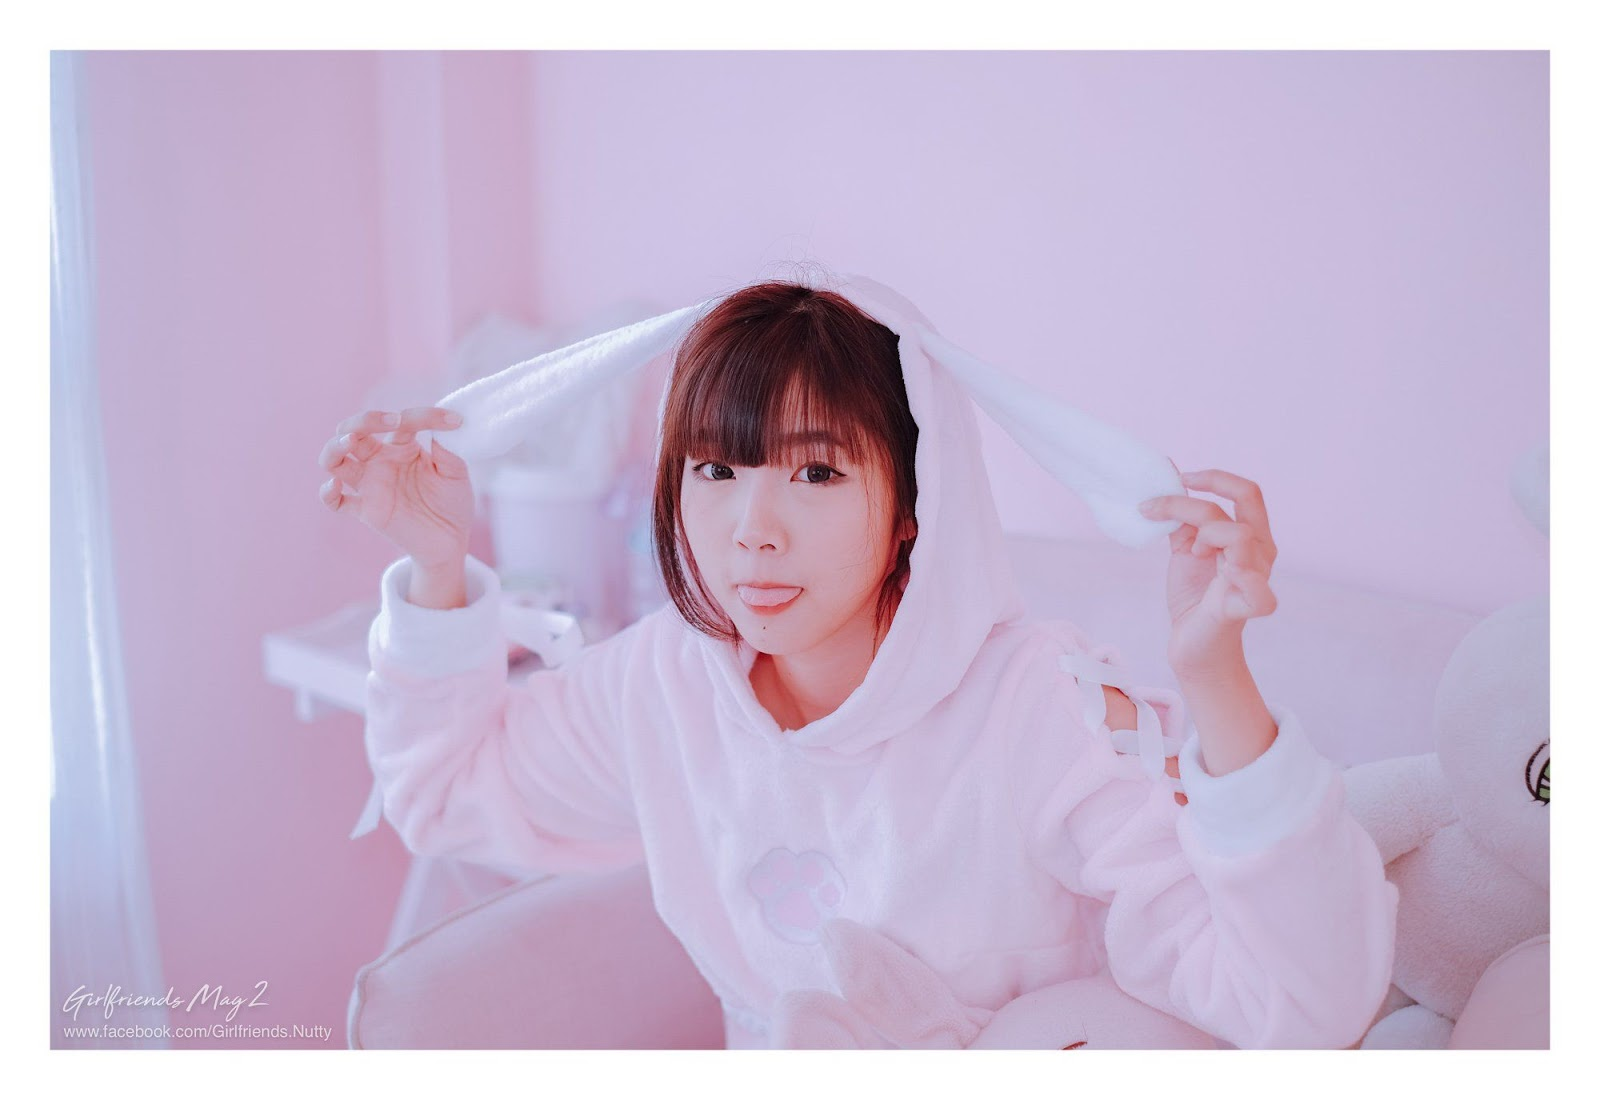 Image Thailand Model - Pakkhagee Arkornpattanakul - Pink Bunny - TruePic.net - Picture-2